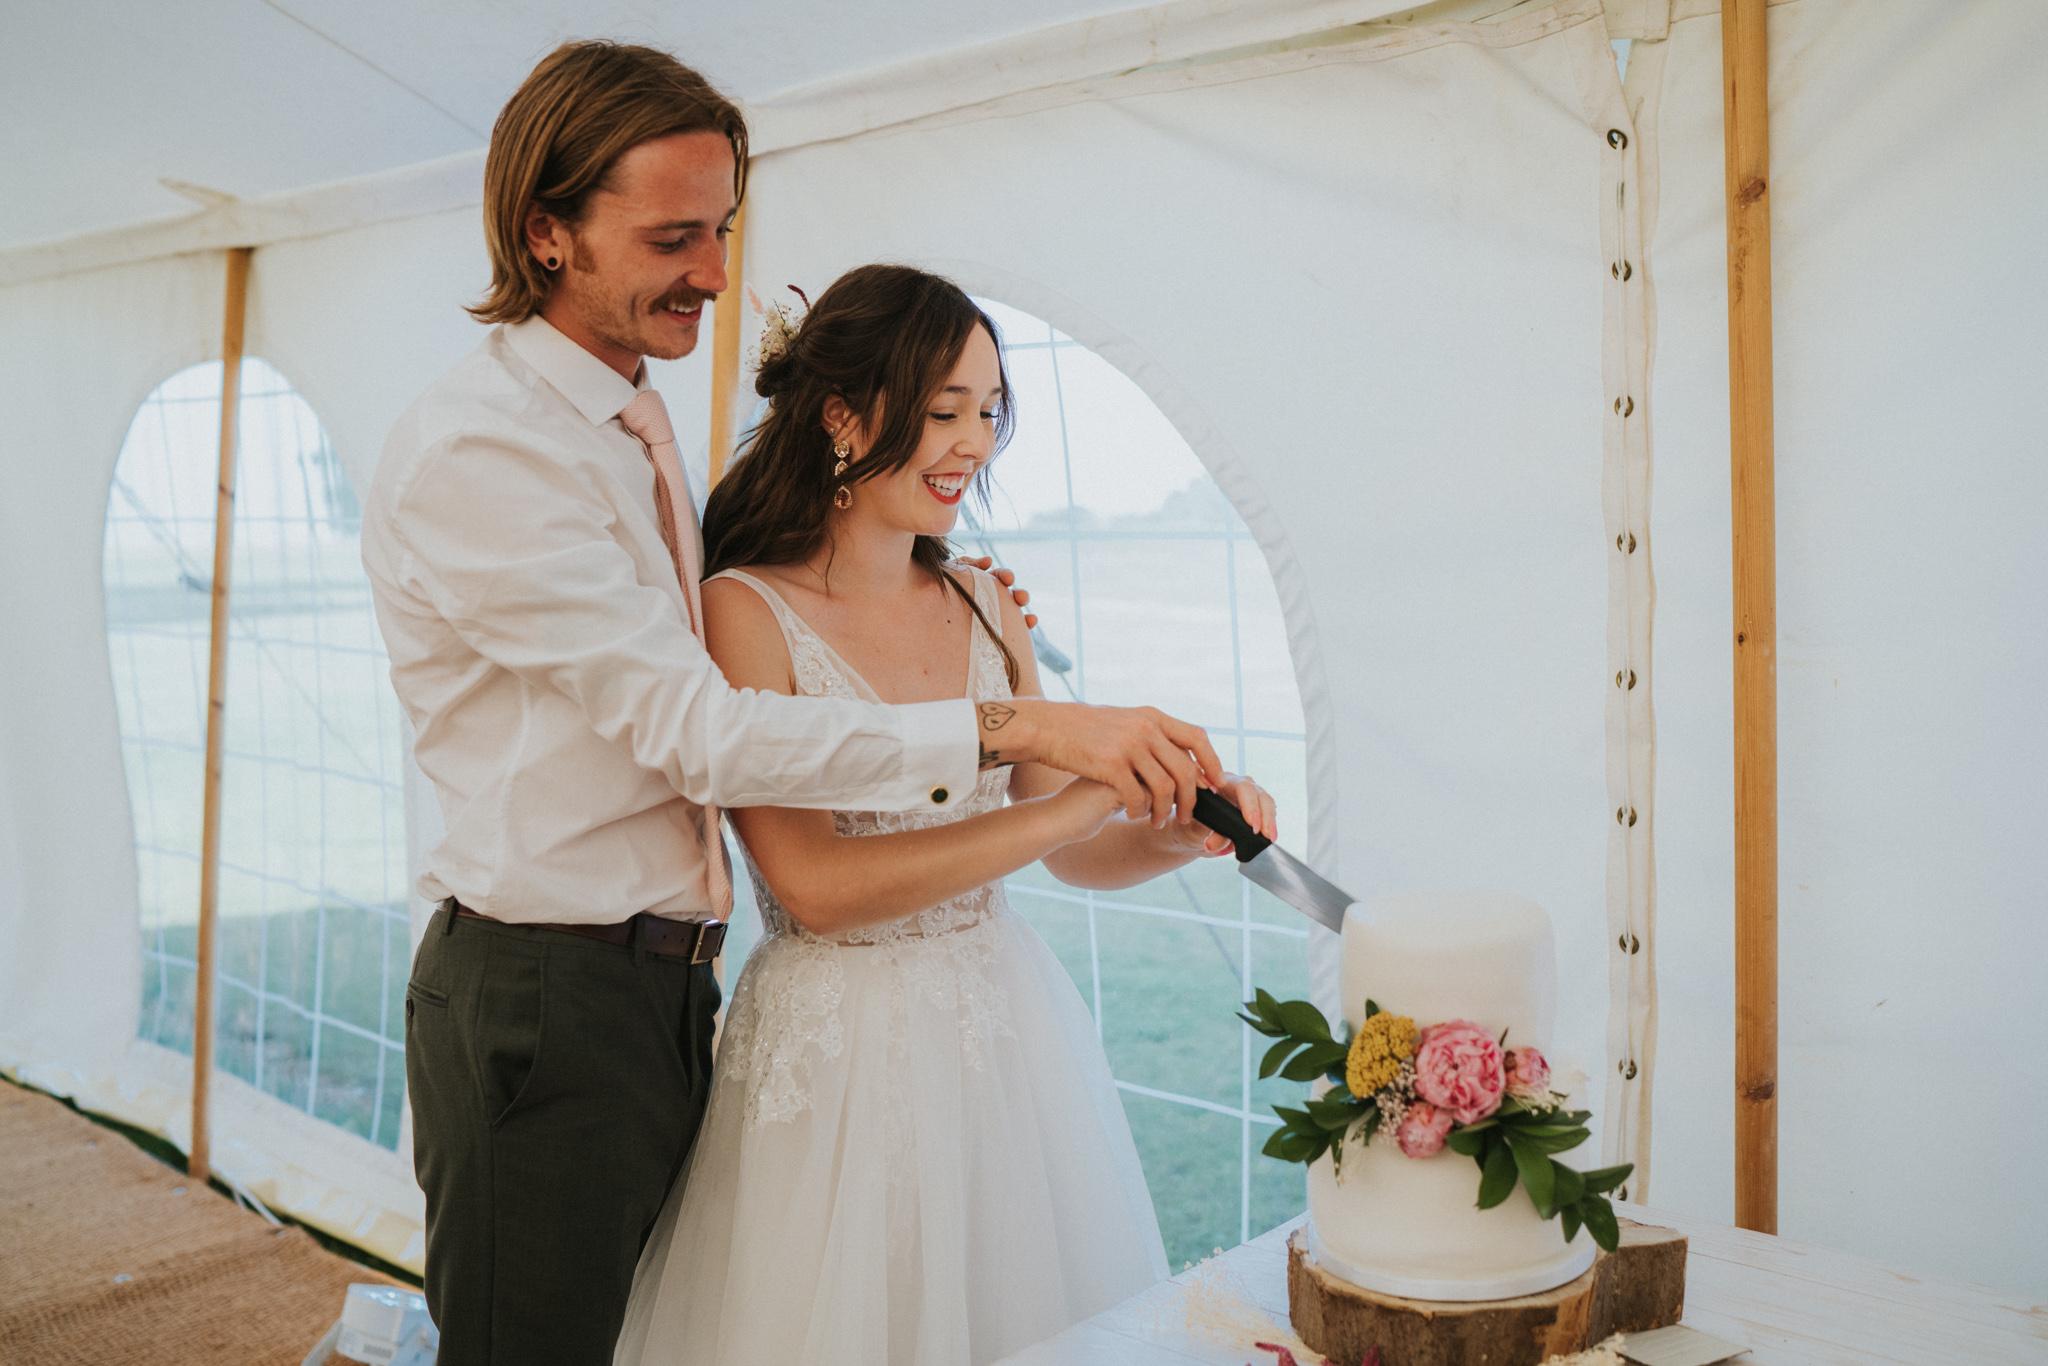 emi-Jack-boho-diy-wedding-eggington-house-grace-elizabeth-colchester-essex-alternative-wedding-photographer-suffolk-norfolk-devon (42 of 56).jpg